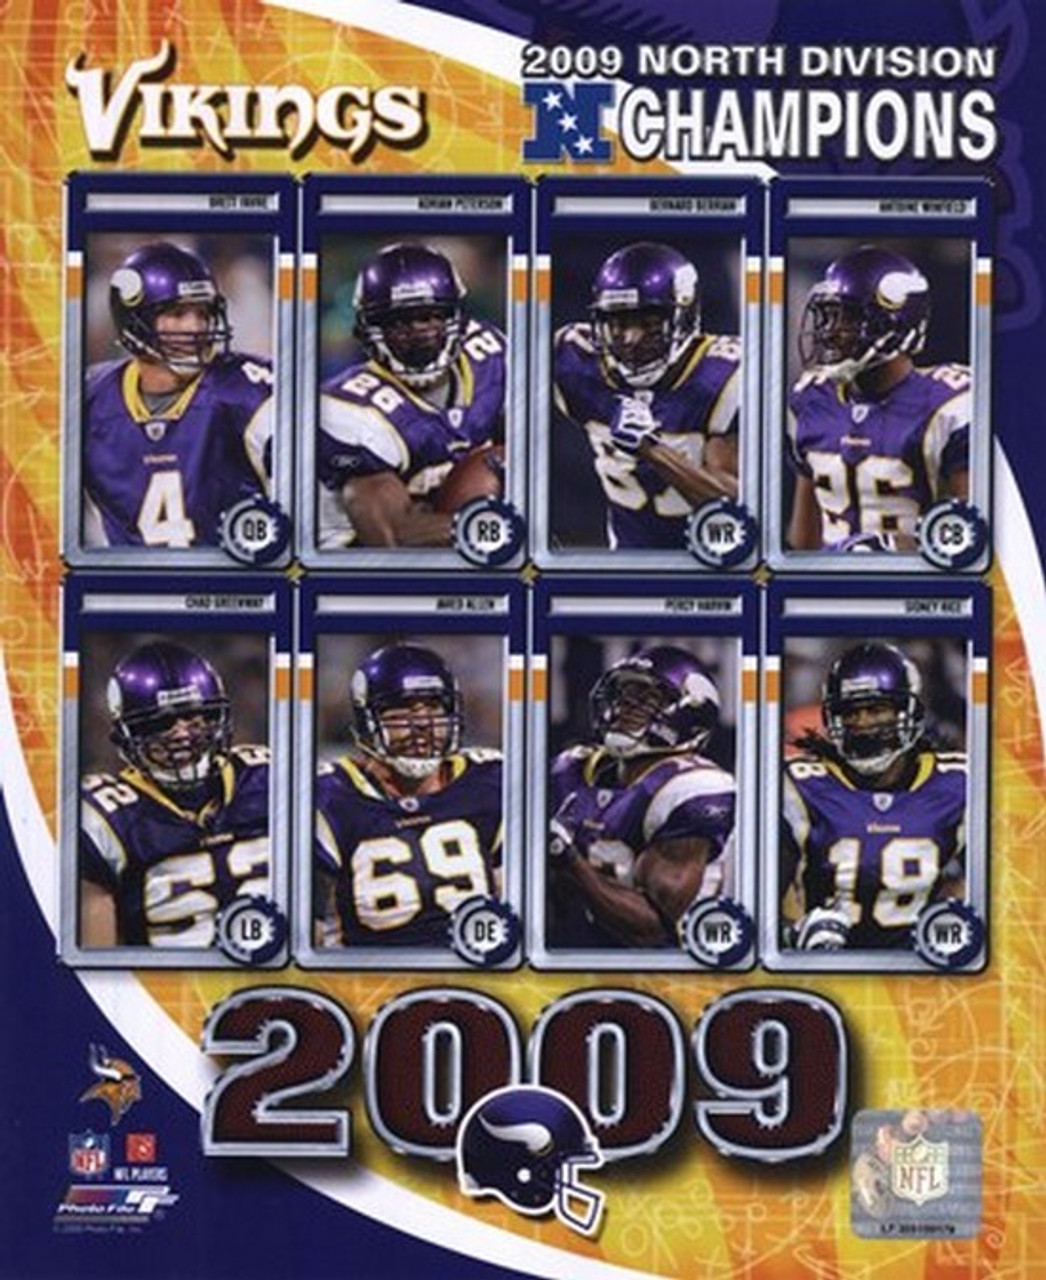 2009 Minnesota Vikings Nfc West Divison Champions Composite Sports Photo Item Varpfsaalz020